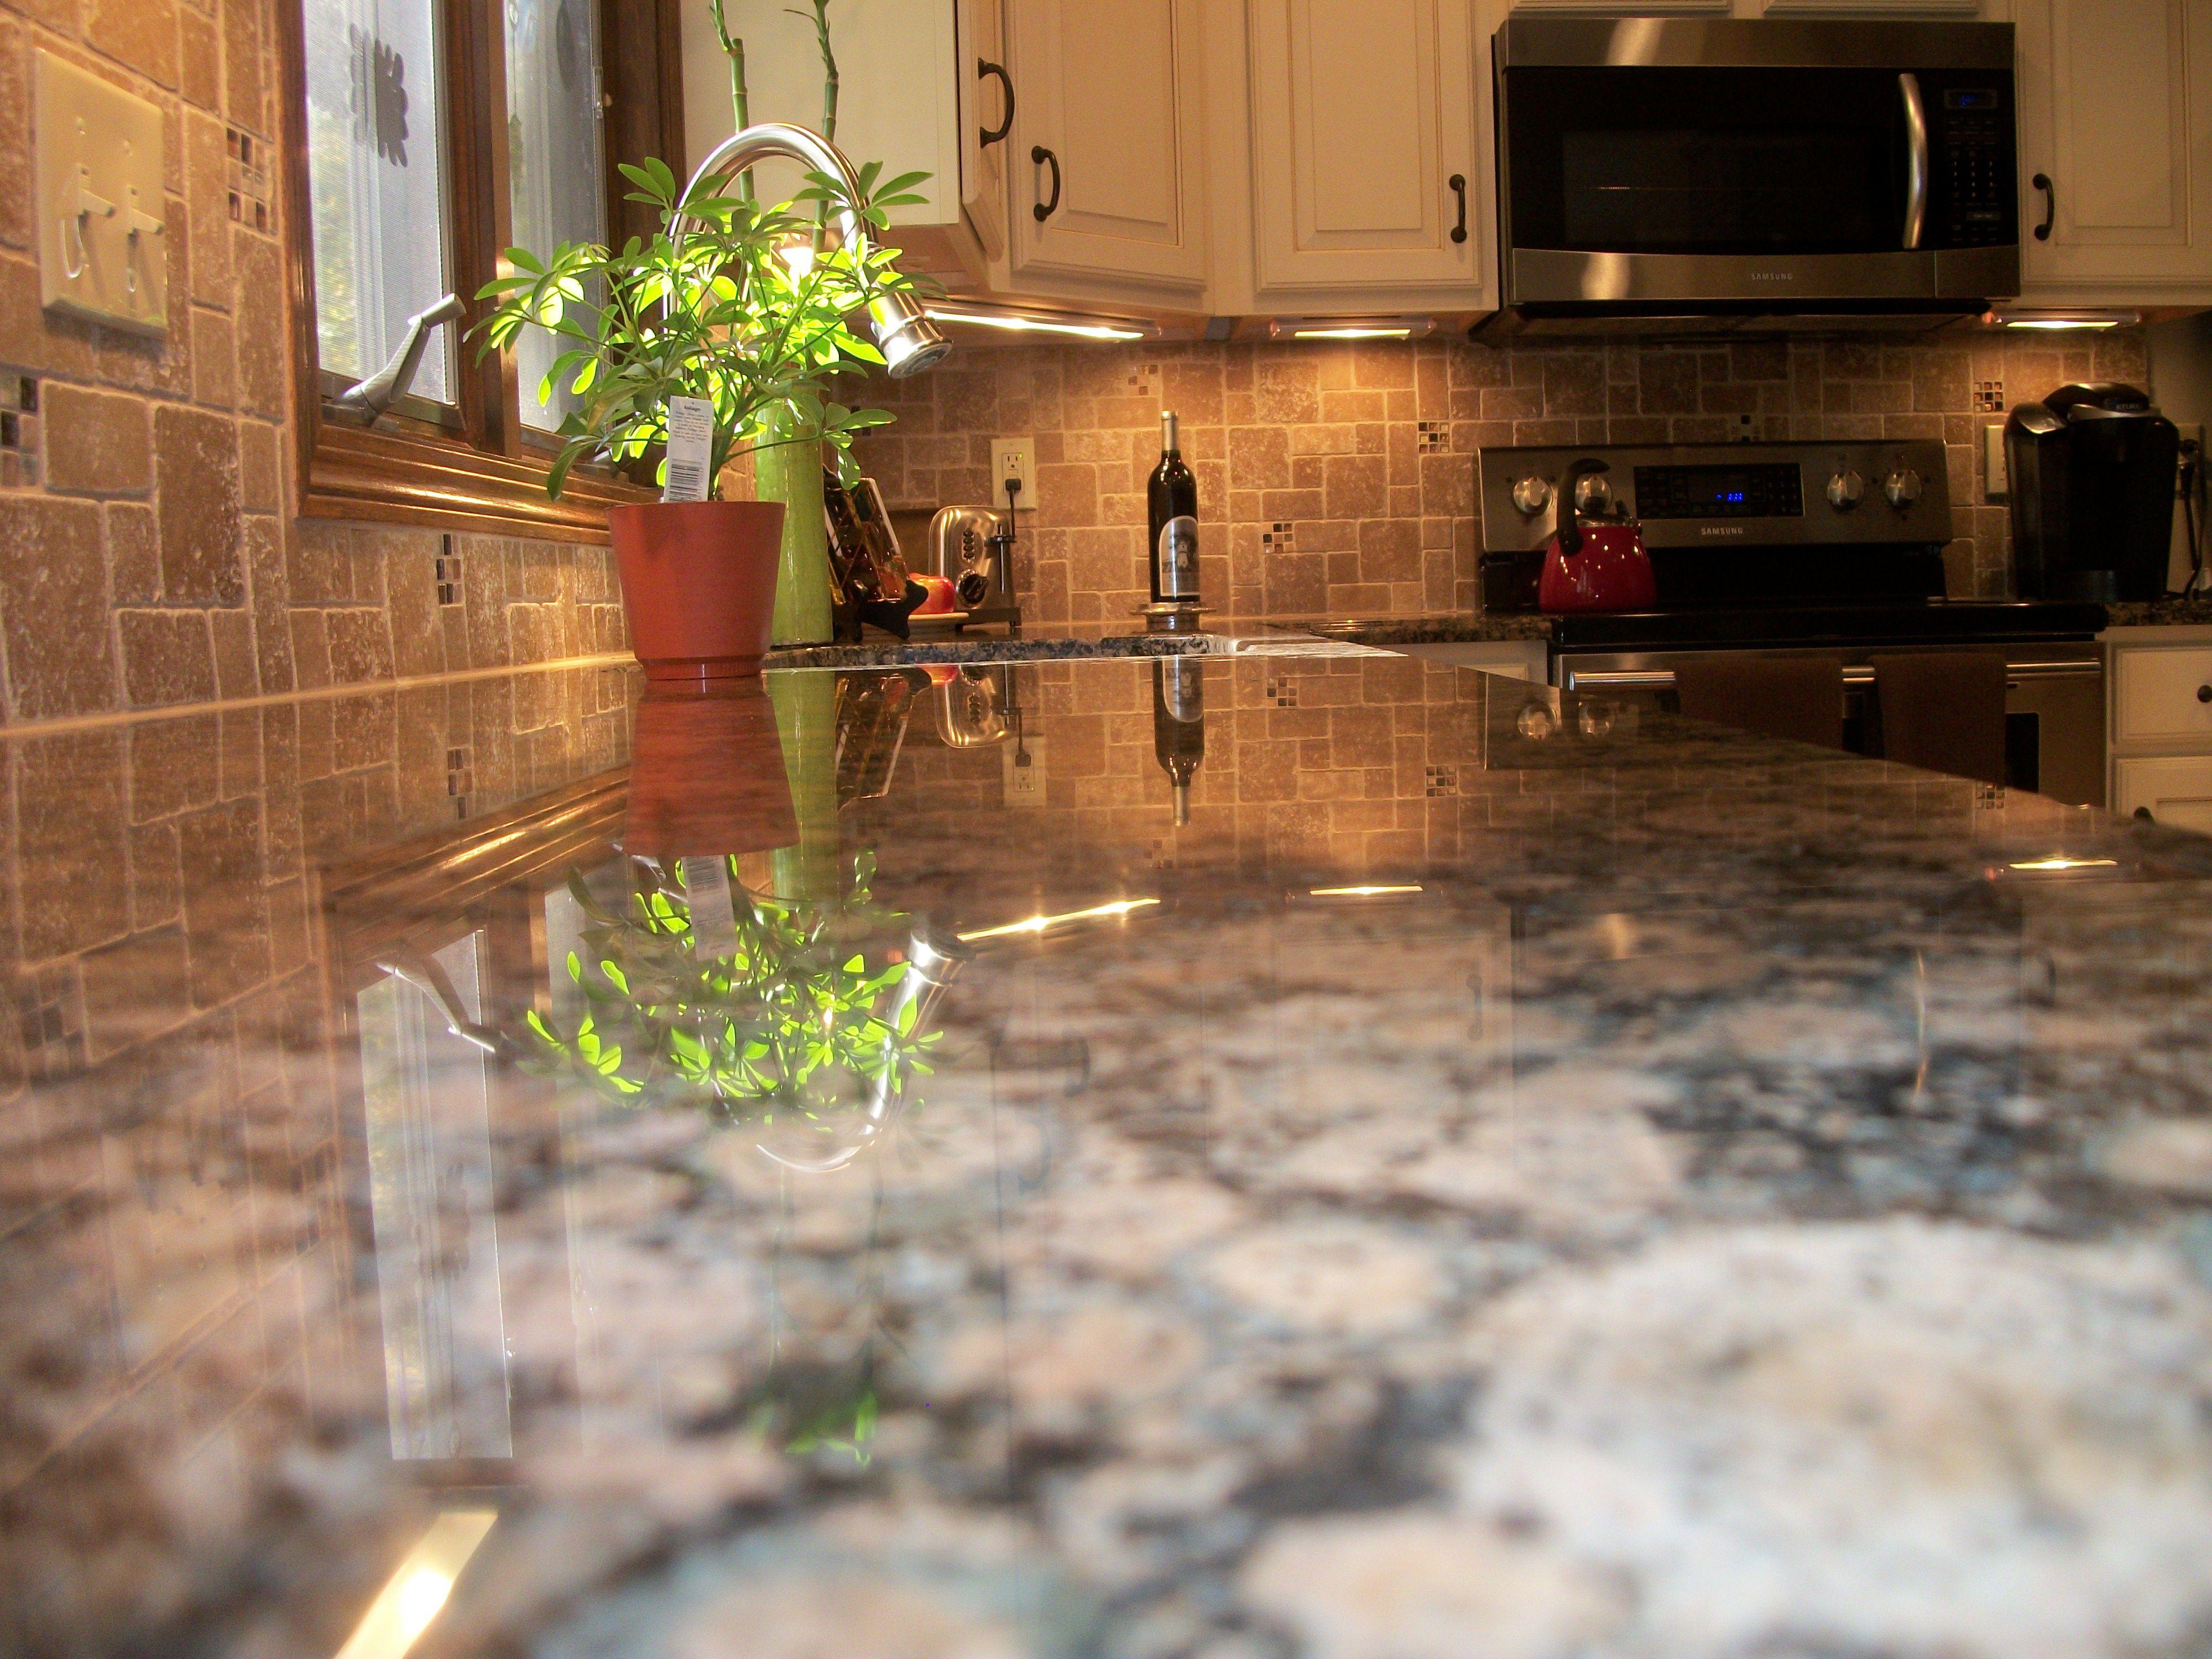 kitchen backsplash backsplash kitchen We installed Baltic Brown Granite countertops and Roman Stone pattern backsplash with glass accents to beautify